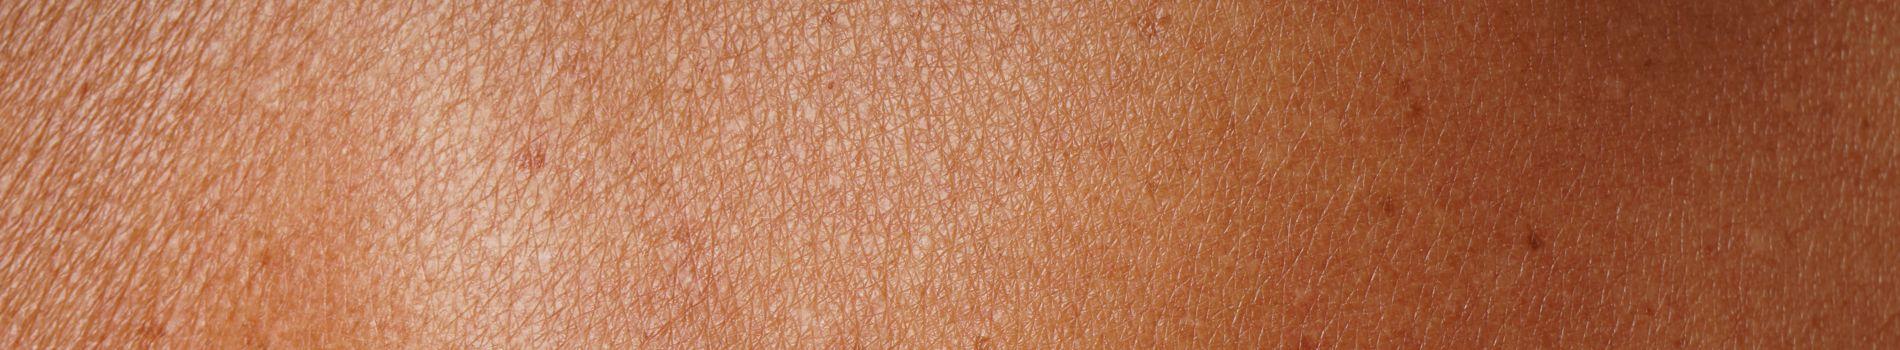 Trans-dermal,  Iodine through the skin?